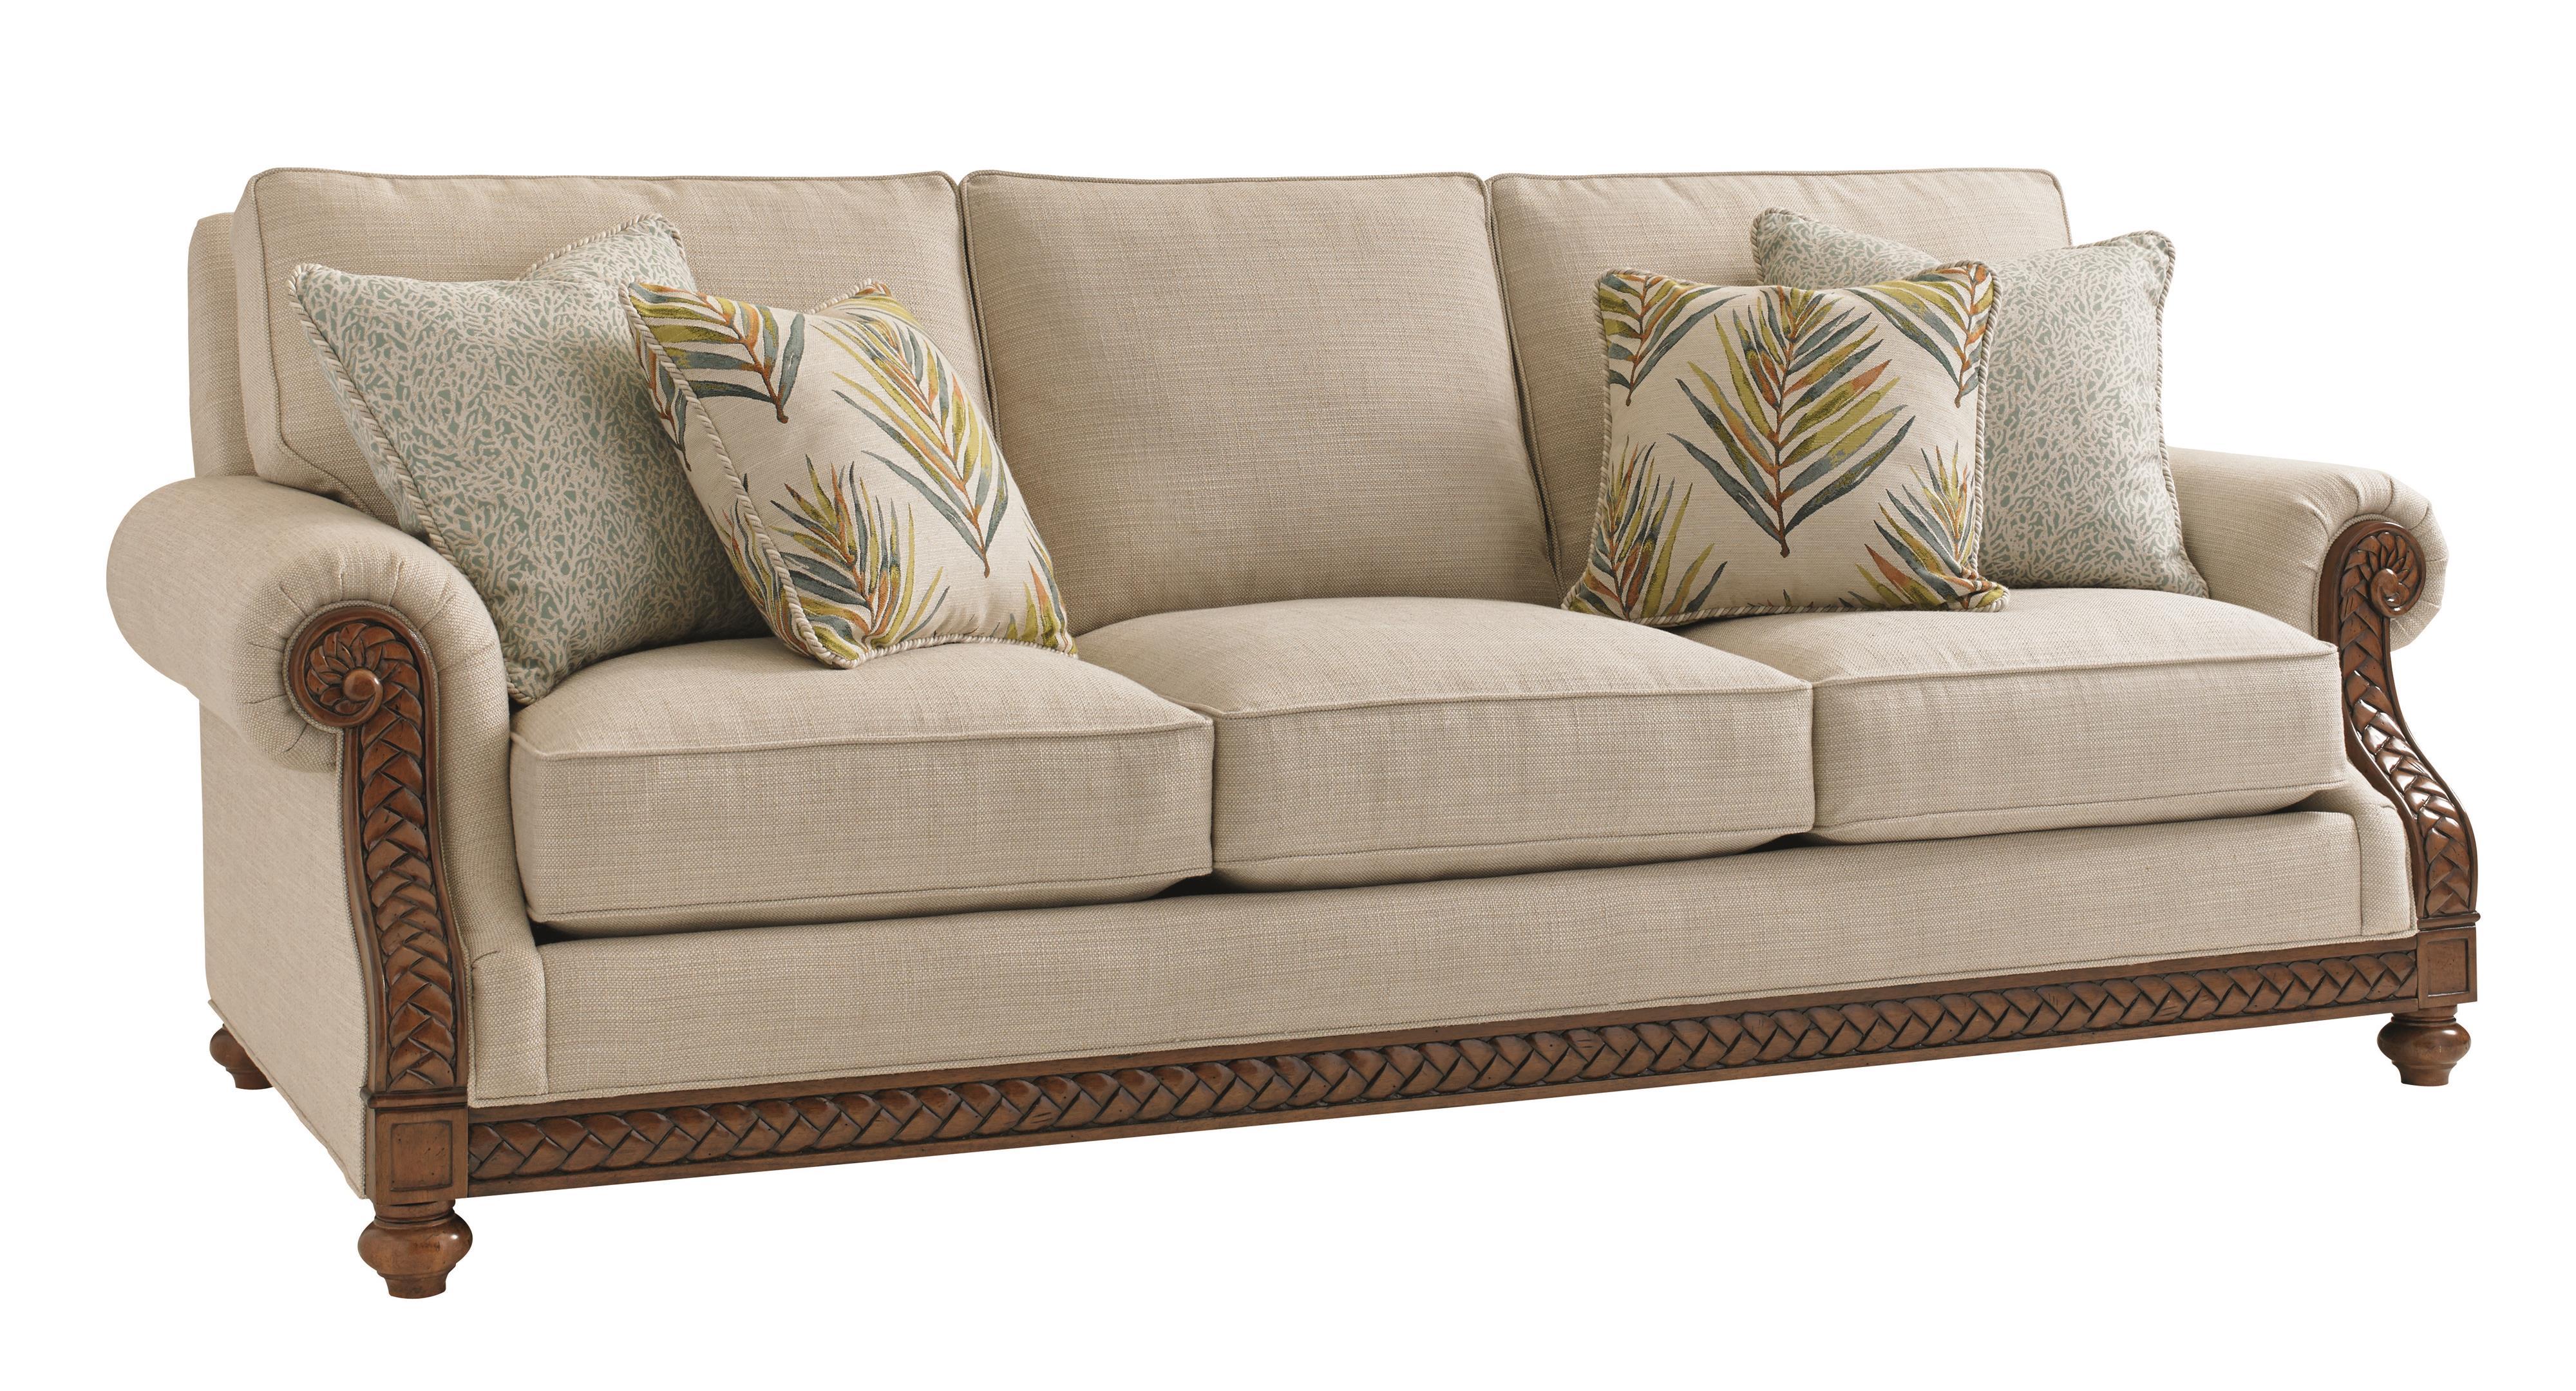 Bali Hai Quickship Shoreline Sofa by Tommy Bahama Home at Baer's Furniture